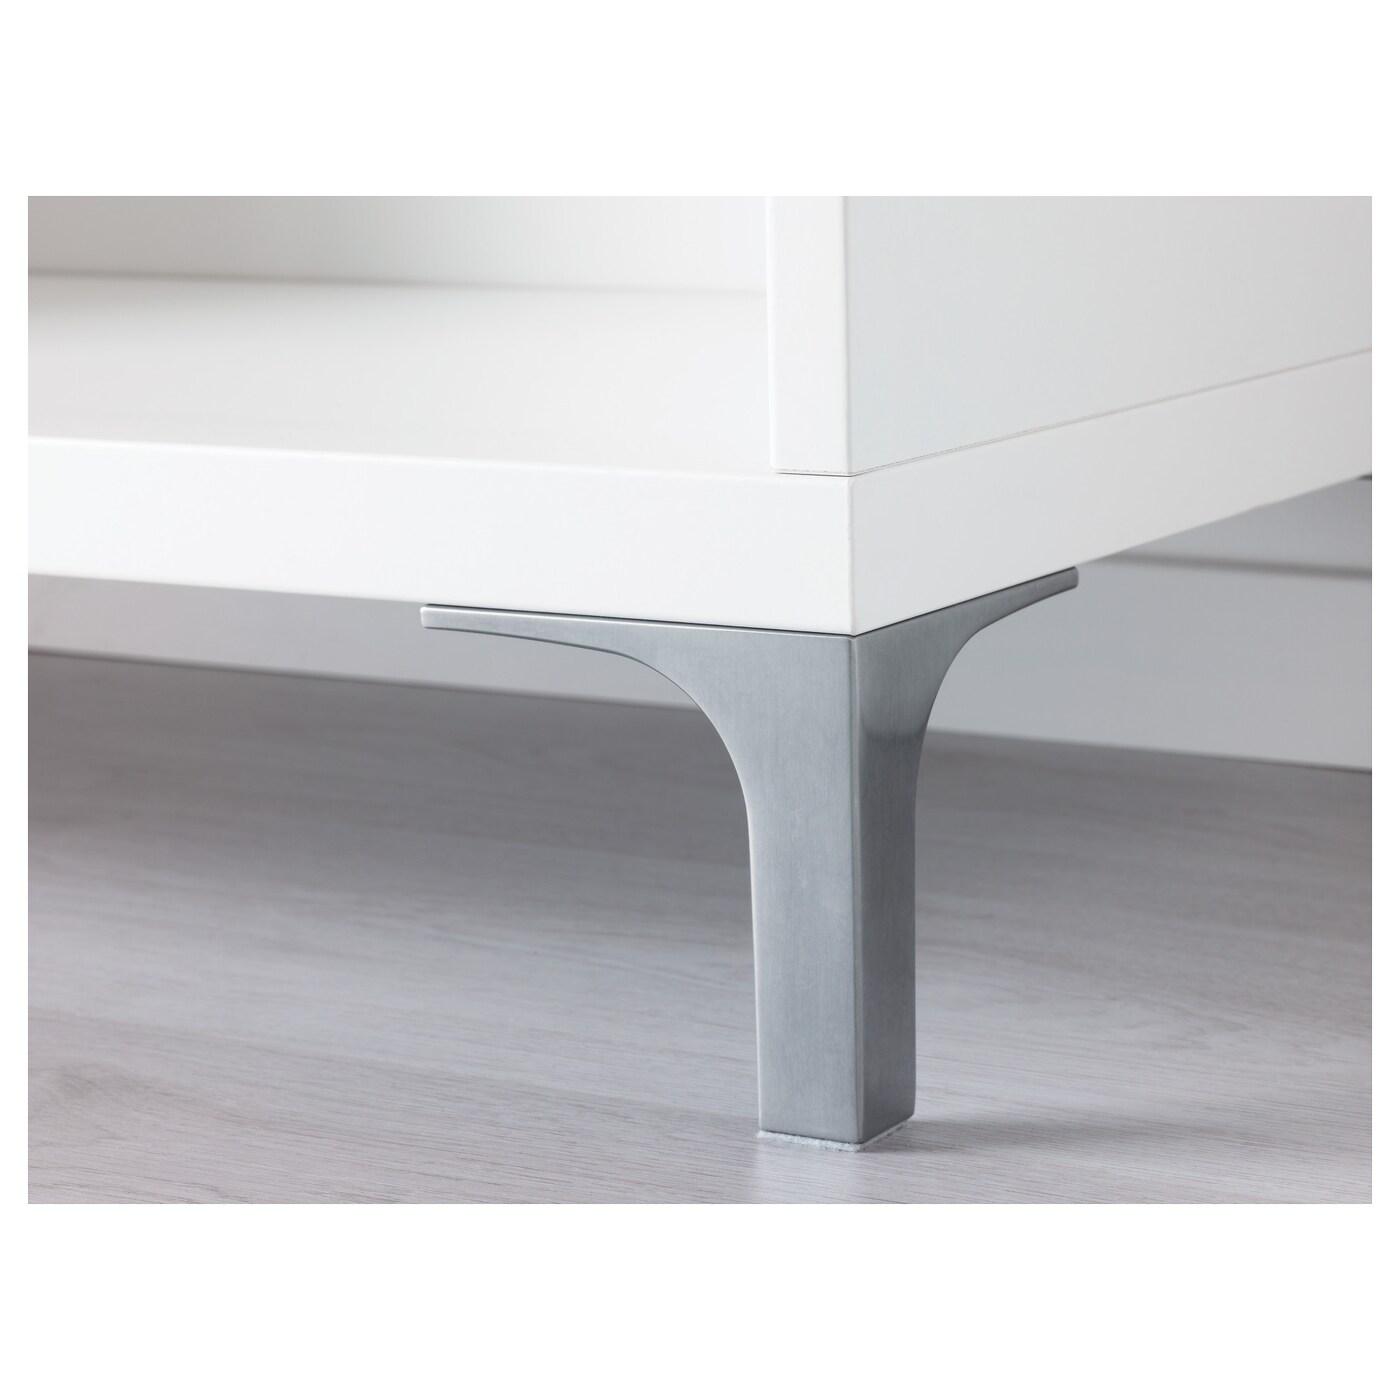 nannarp leg aluminium ikea. Black Bedroom Furniture Sets. Home Design Ideas